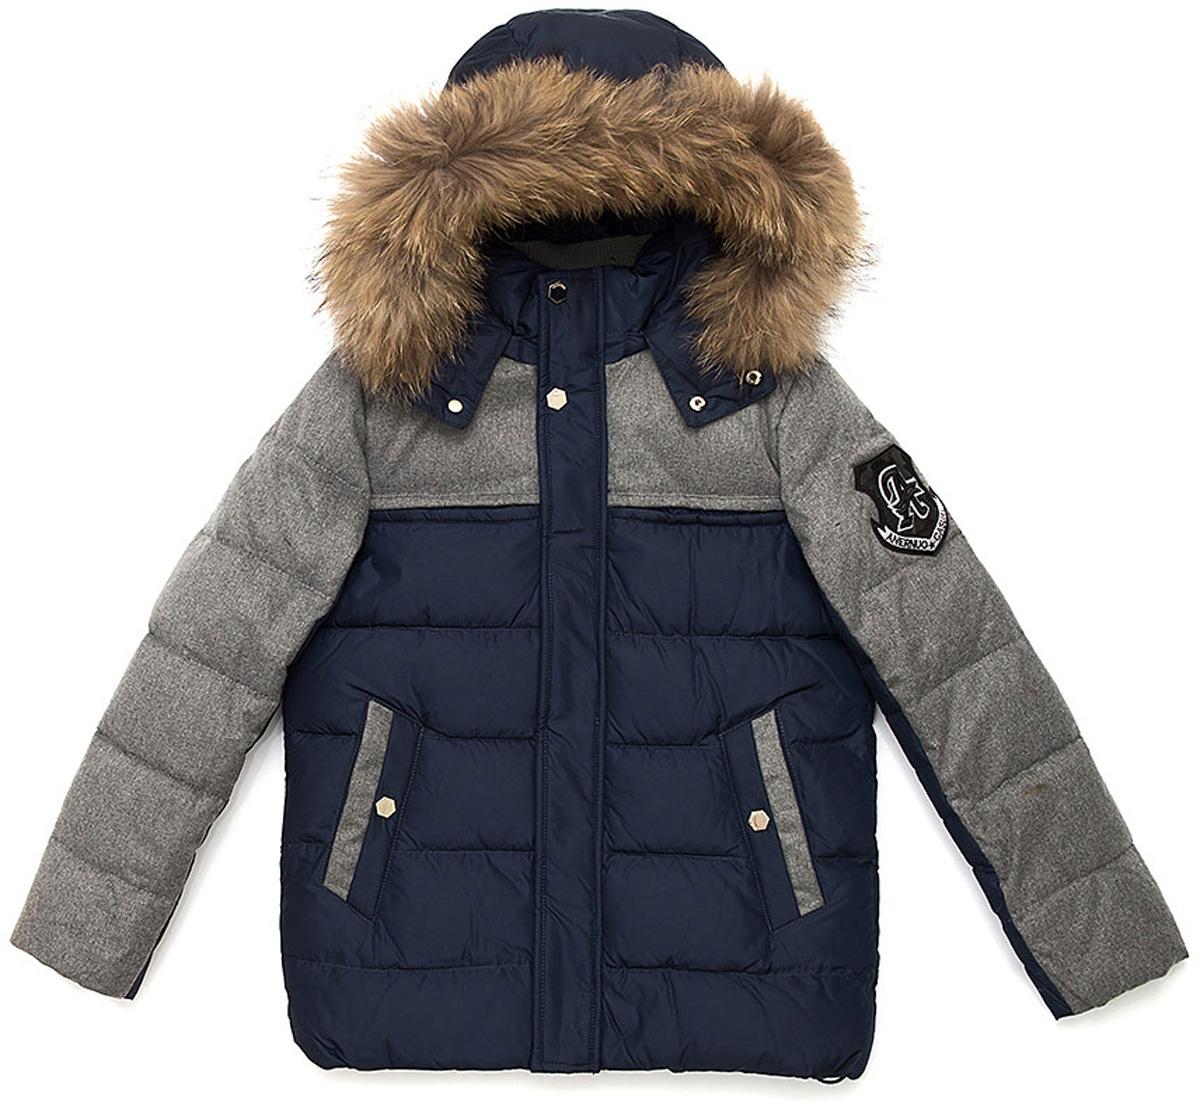 Фото Куртка для мальчика Vitacci, цвет: синий. 1171484-04. Размер 160